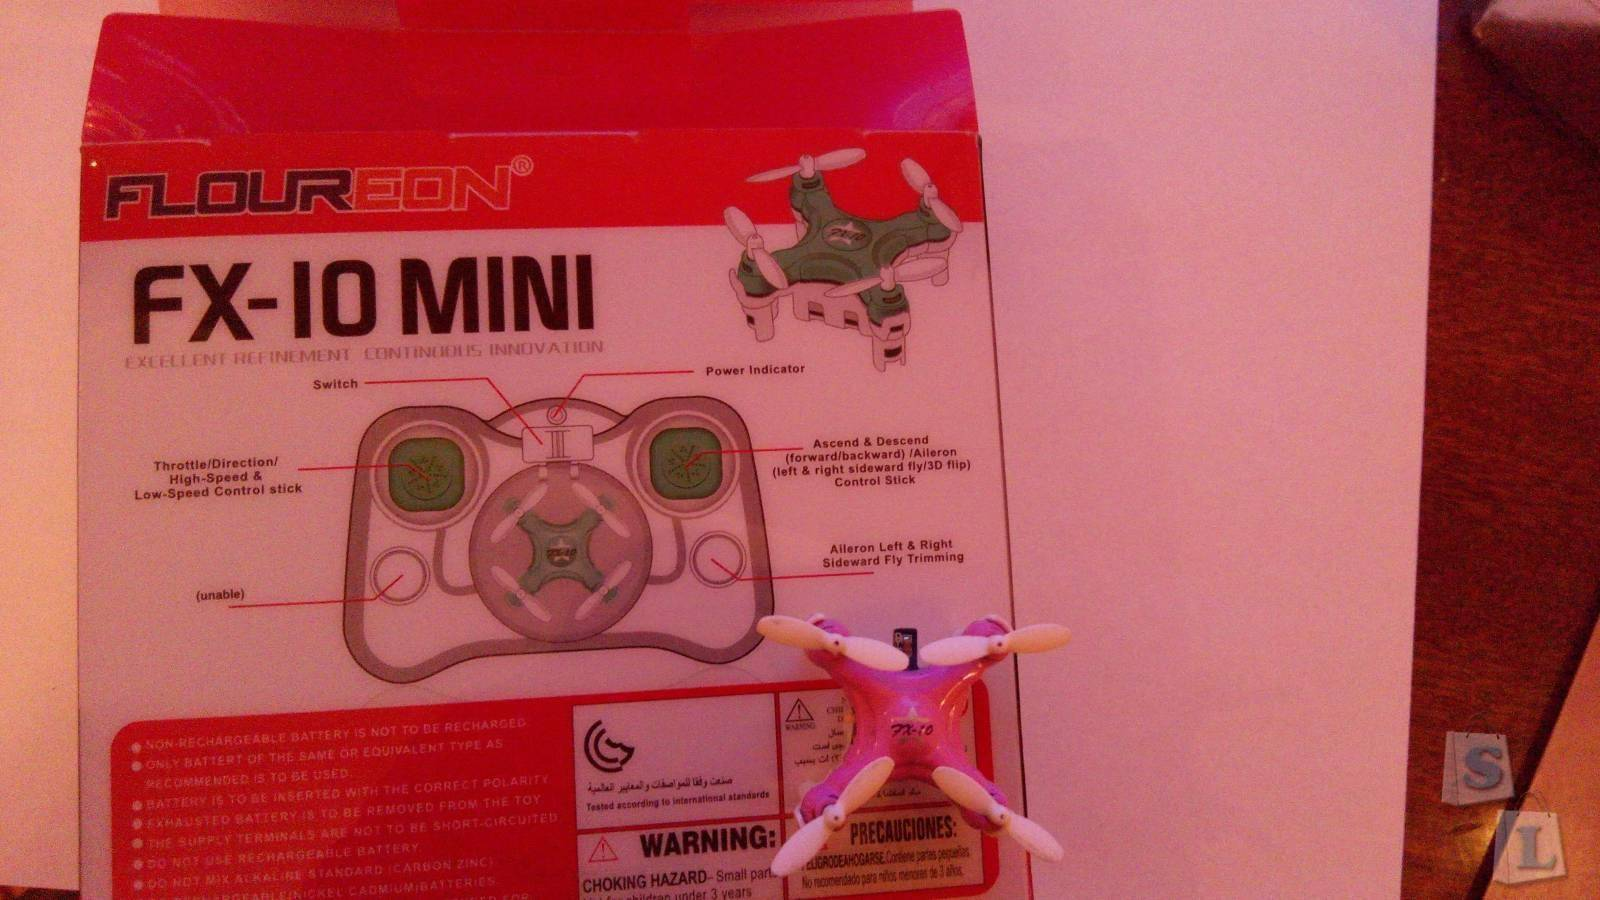 GearBest: Обзор приза из конкурса от Gearbest - Floureon FX-10 Mini!